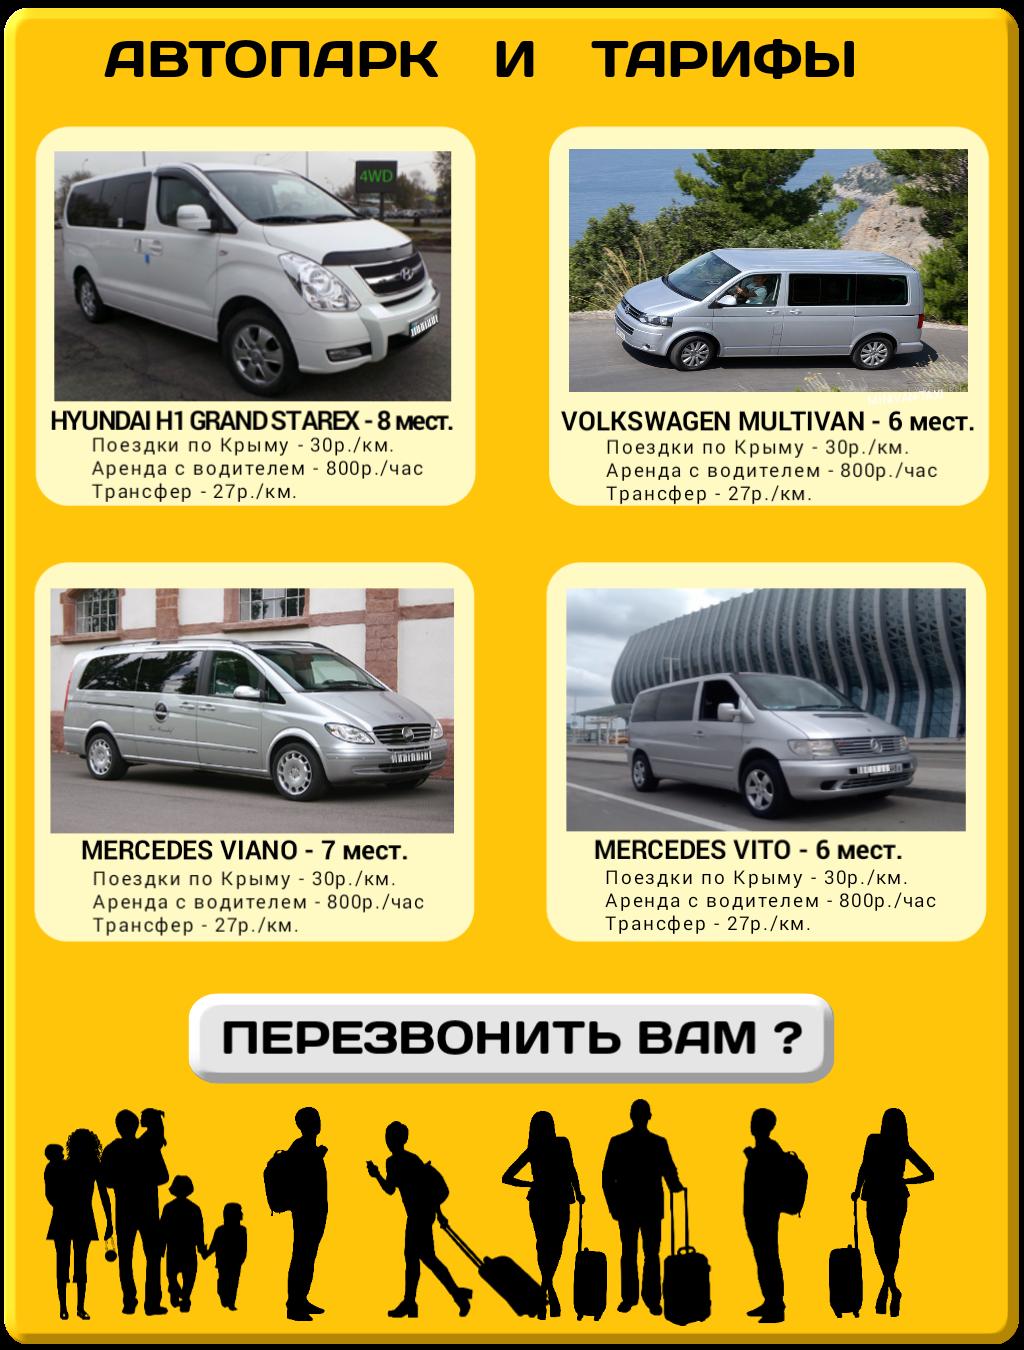 Такси минивэн автопарк